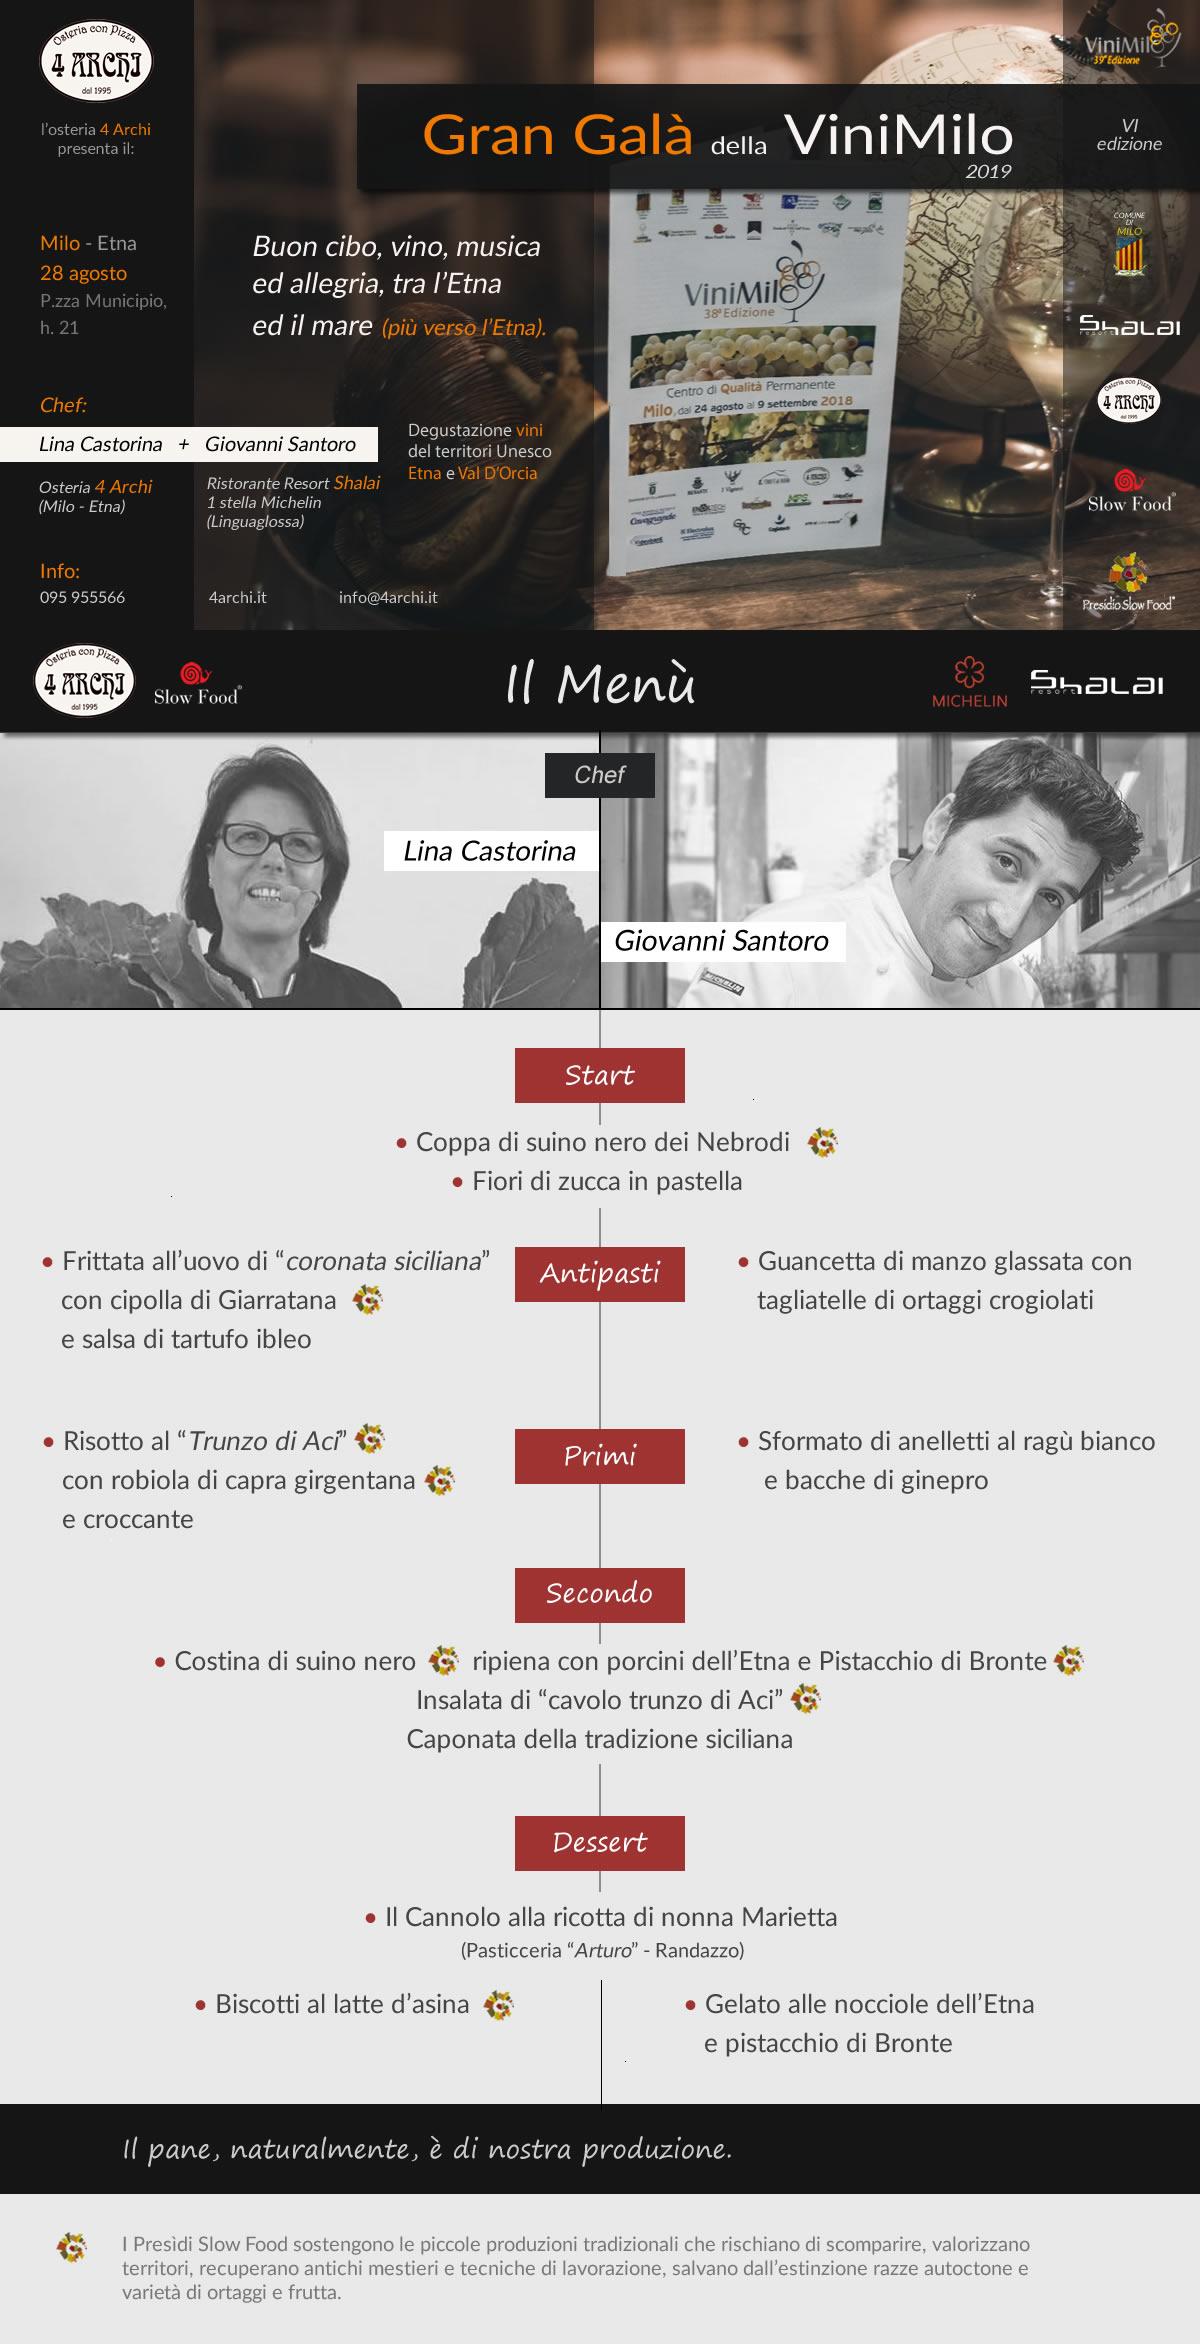 GranGala2019-menu